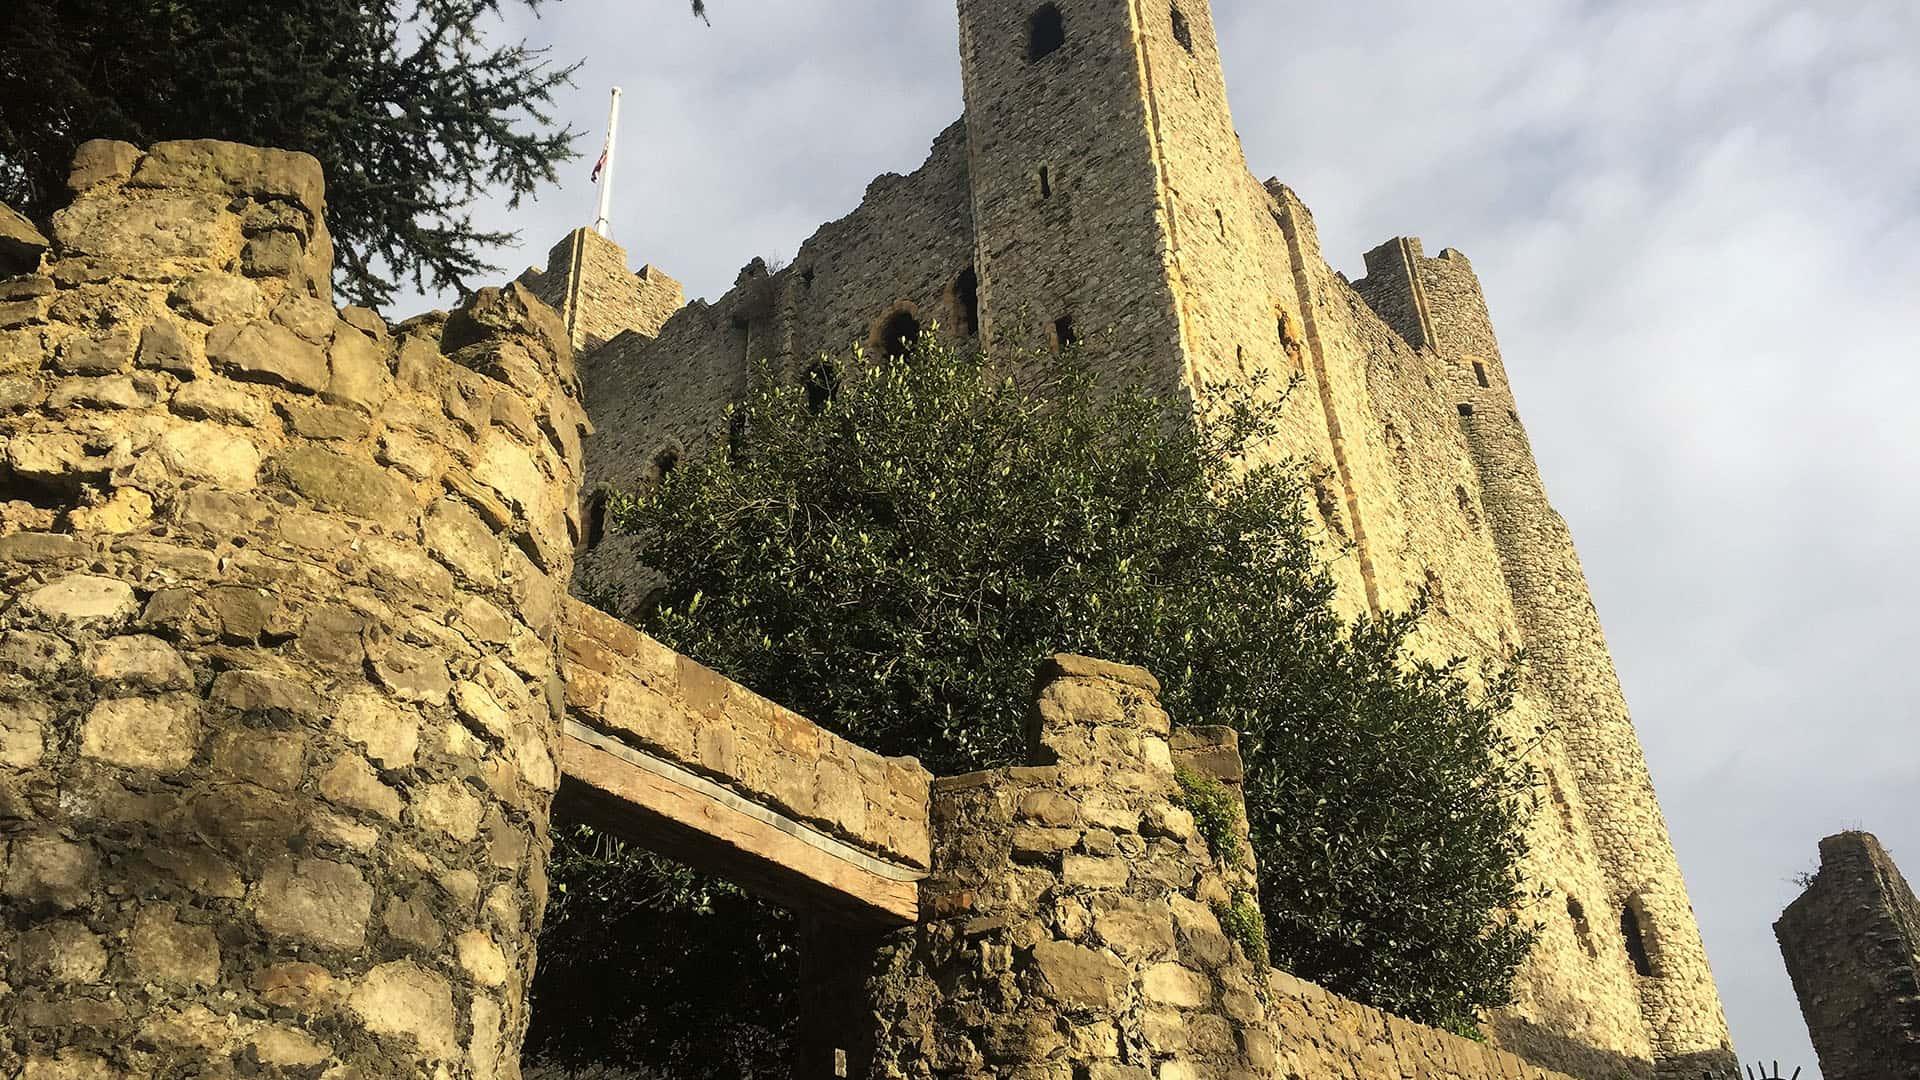 Rochester Castle from below